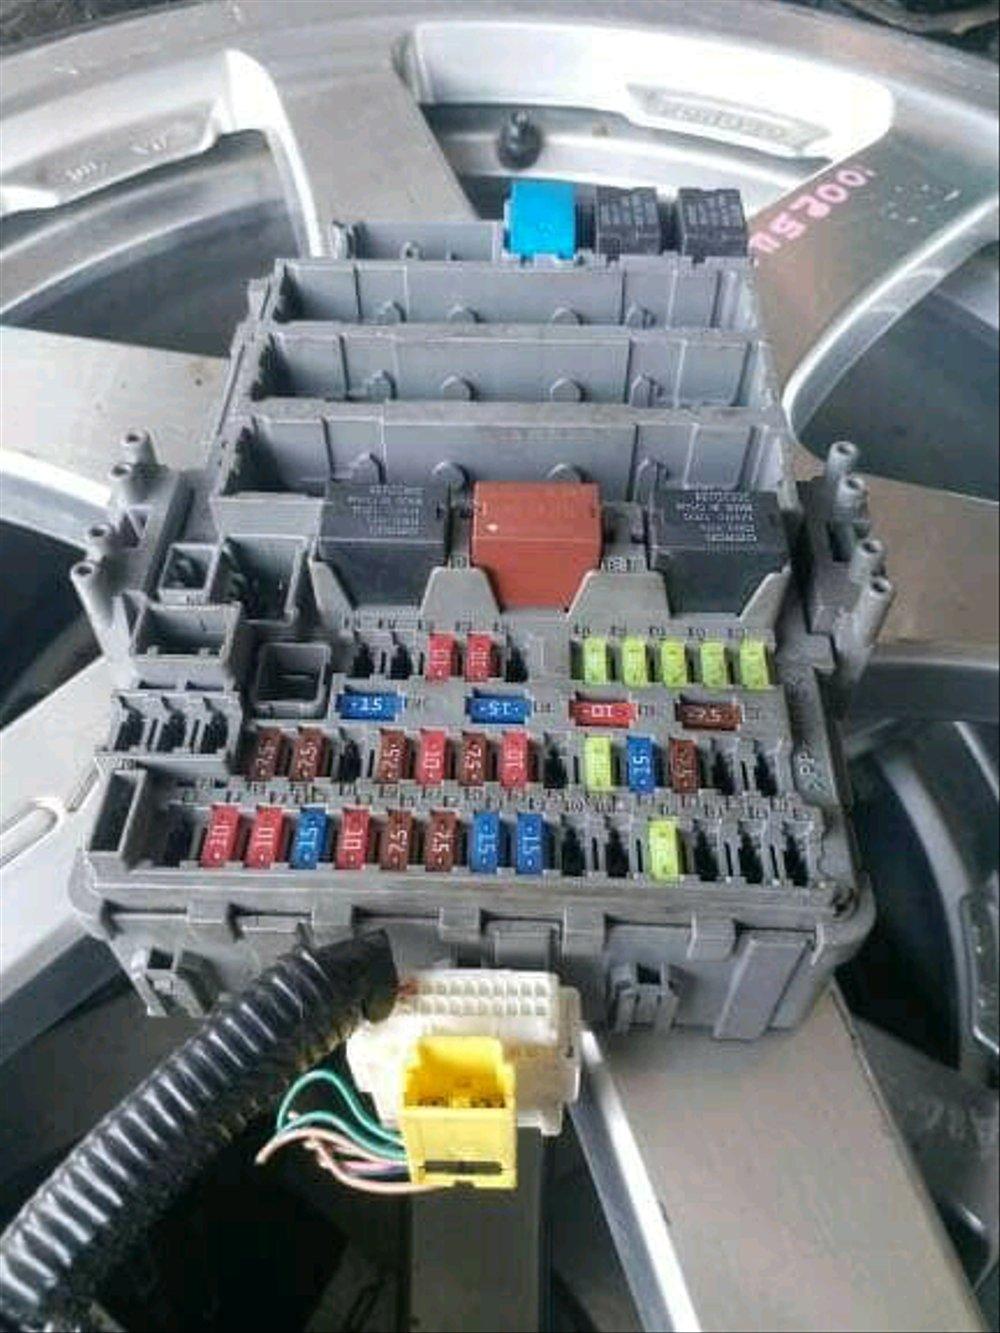 medium resolution of honda crv 2013 box sikring dalam micu etac fuse box toa